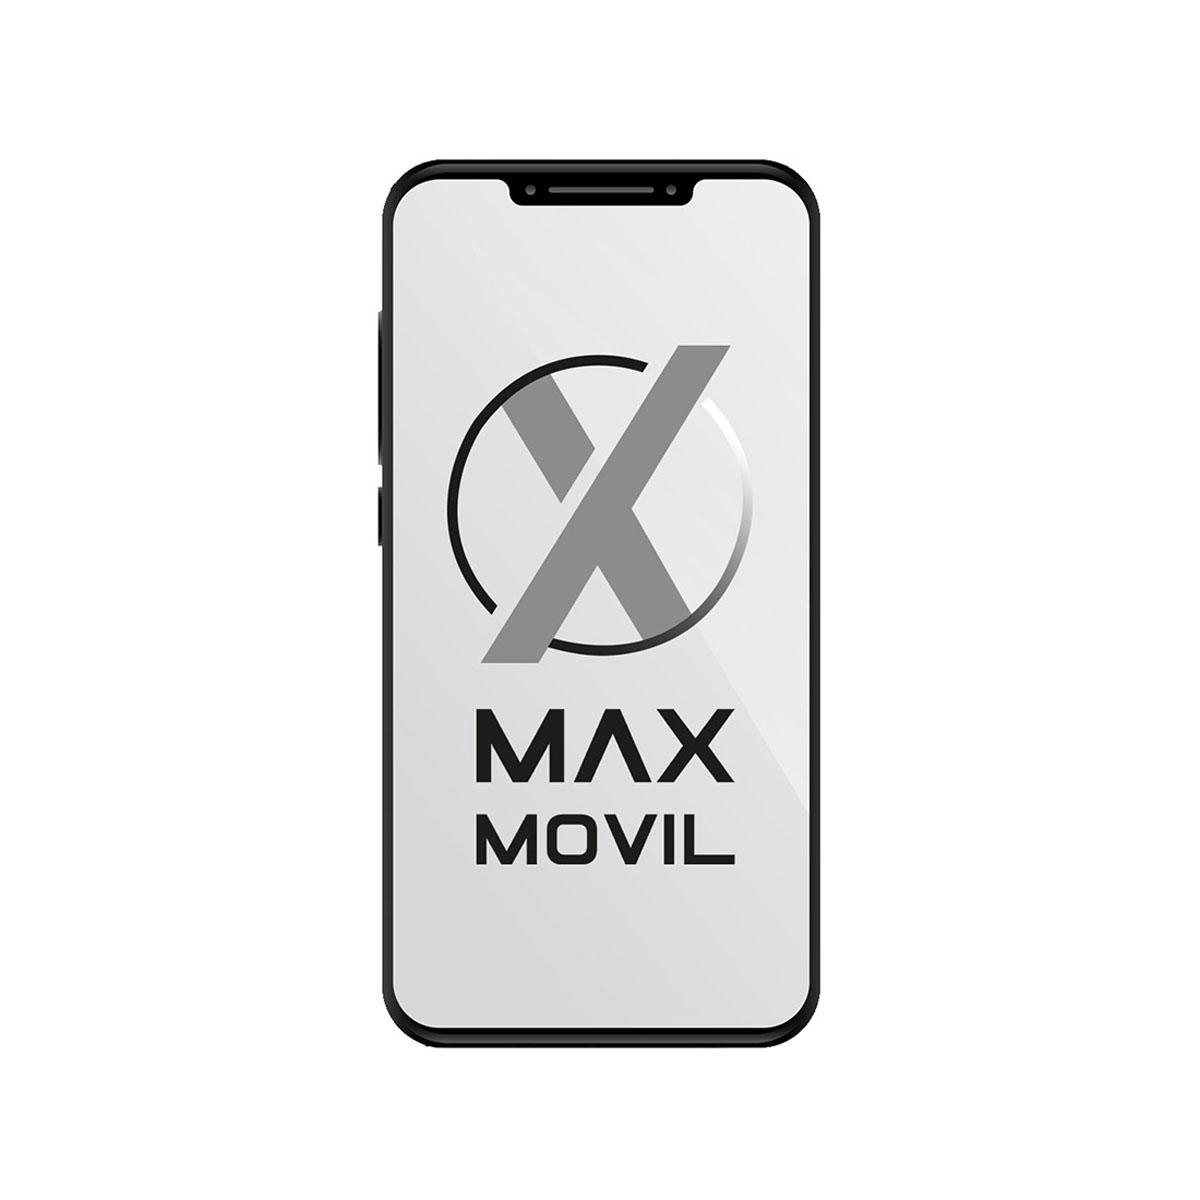 "Disco duro externo 2.5"" 1TB Maxtor  STSHX-M101TCBM Seagate USB 3.0"